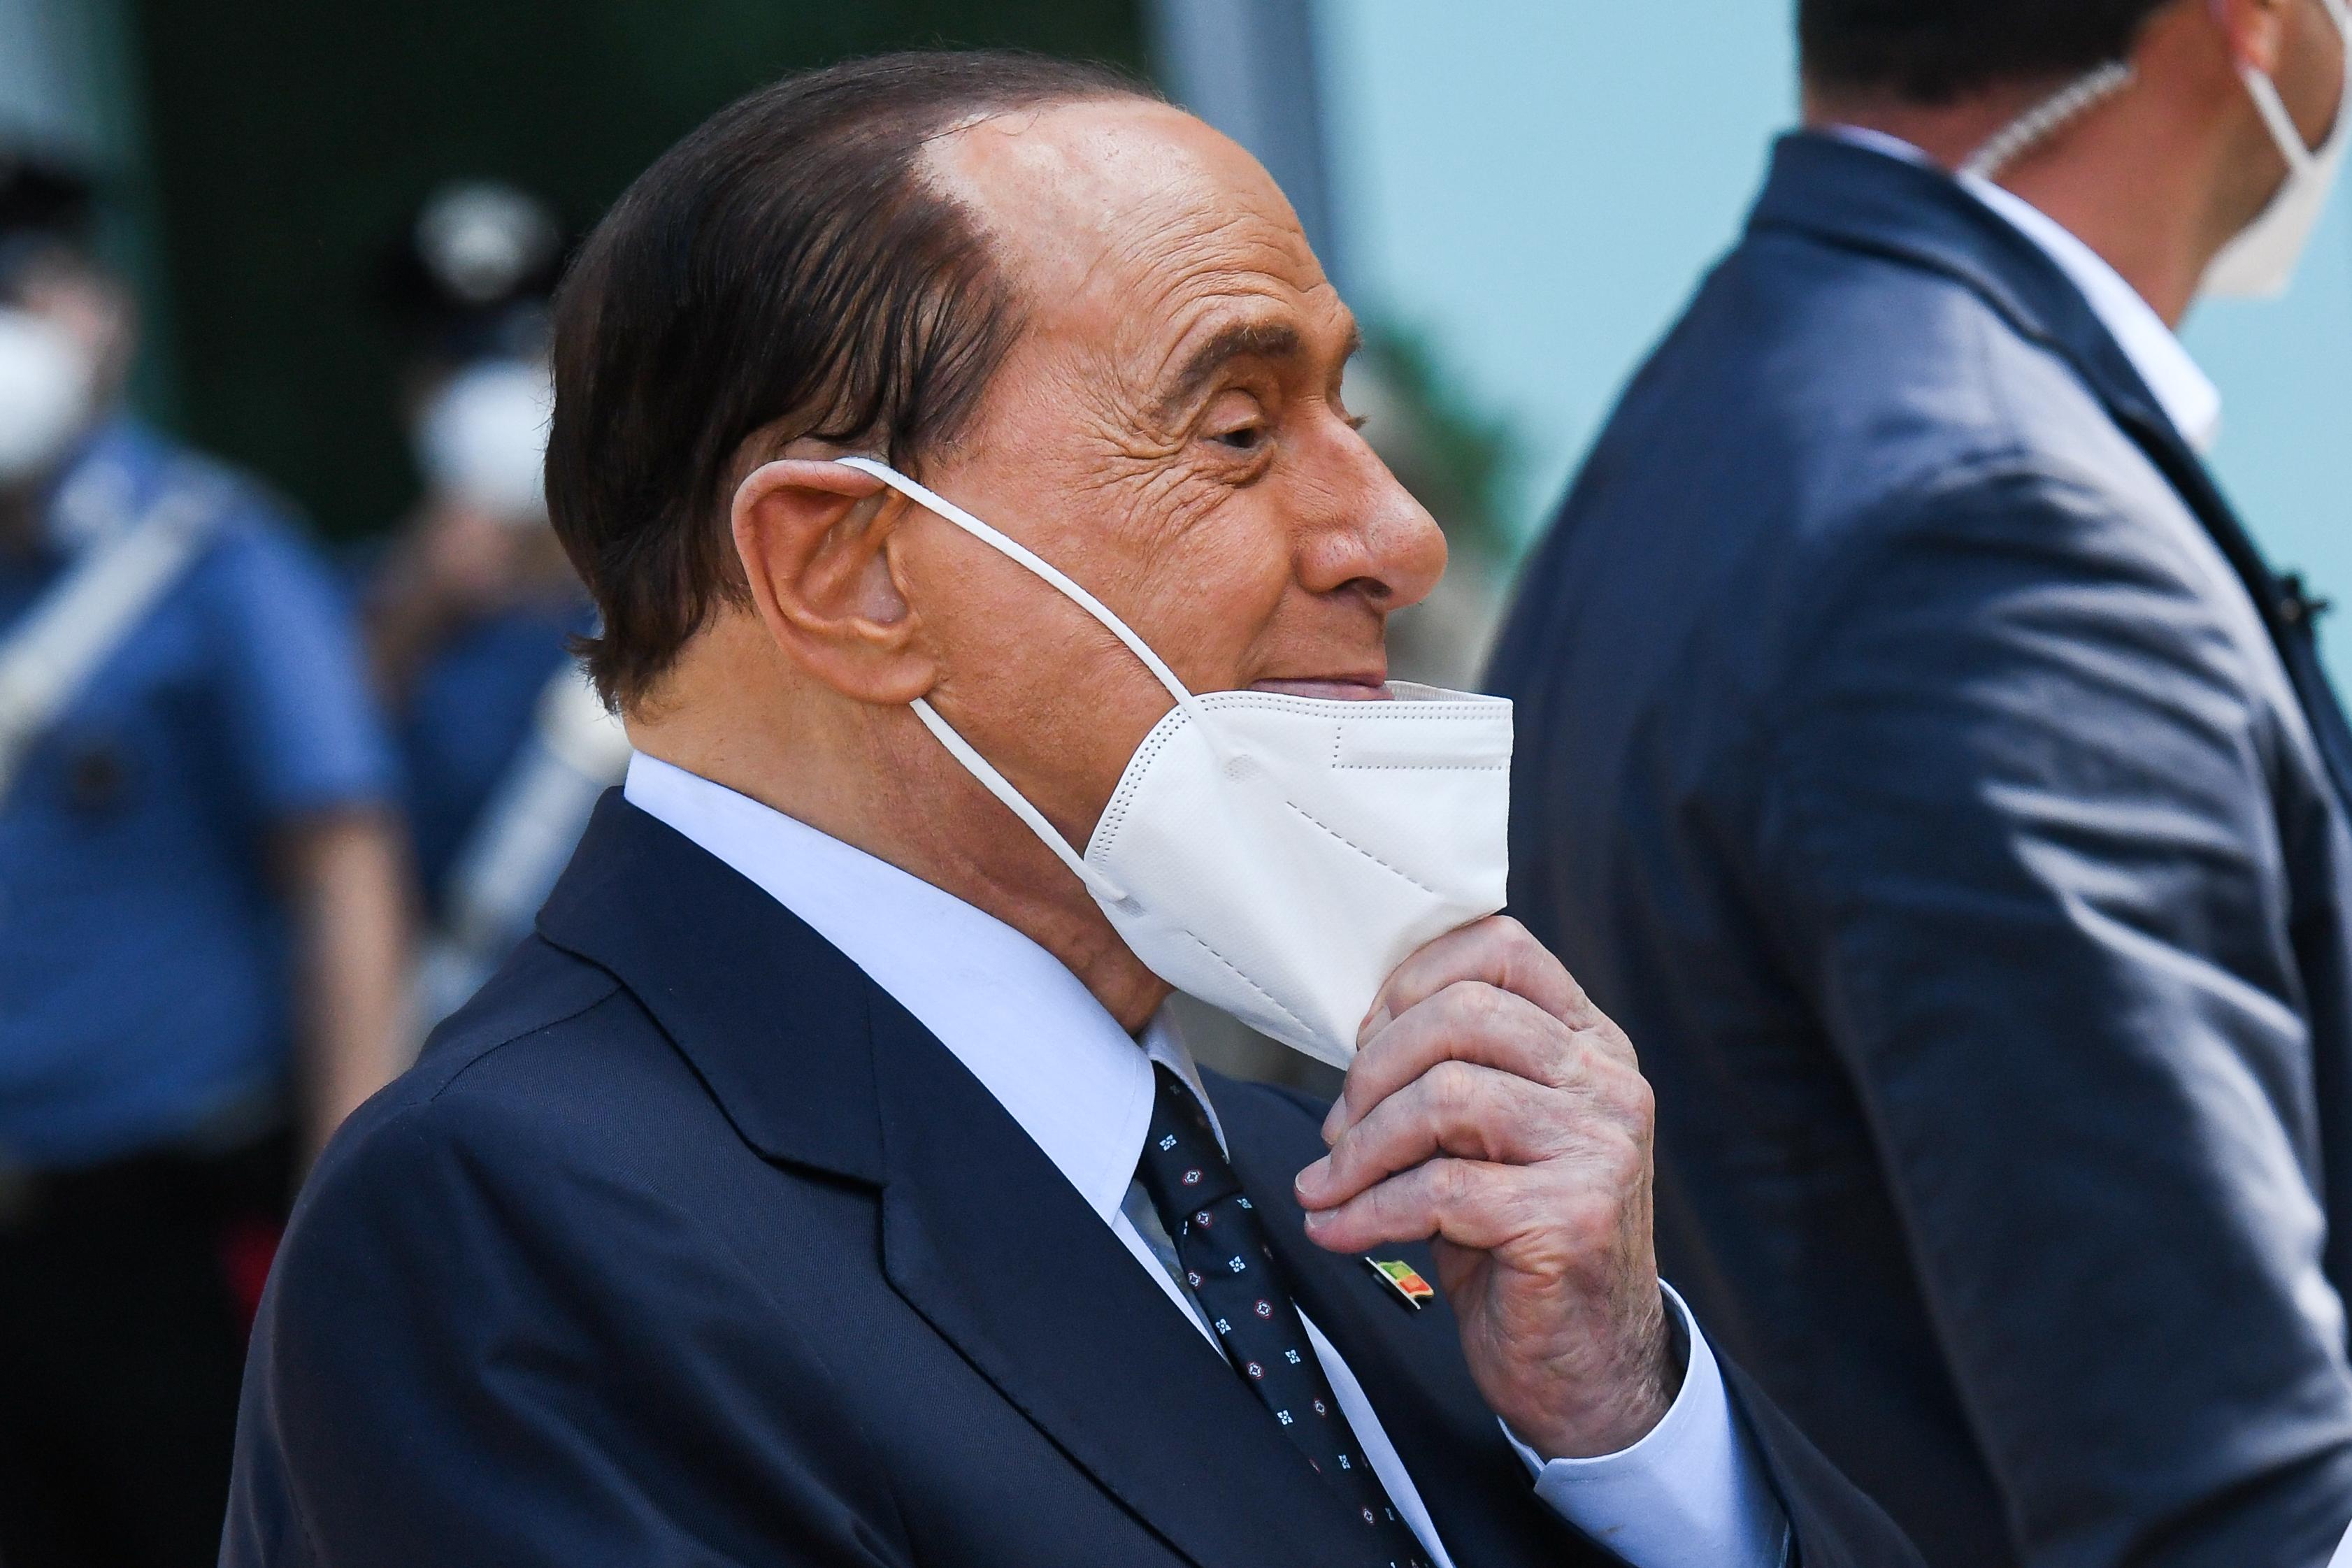 Újra kórházban van Silvio Berlusconi